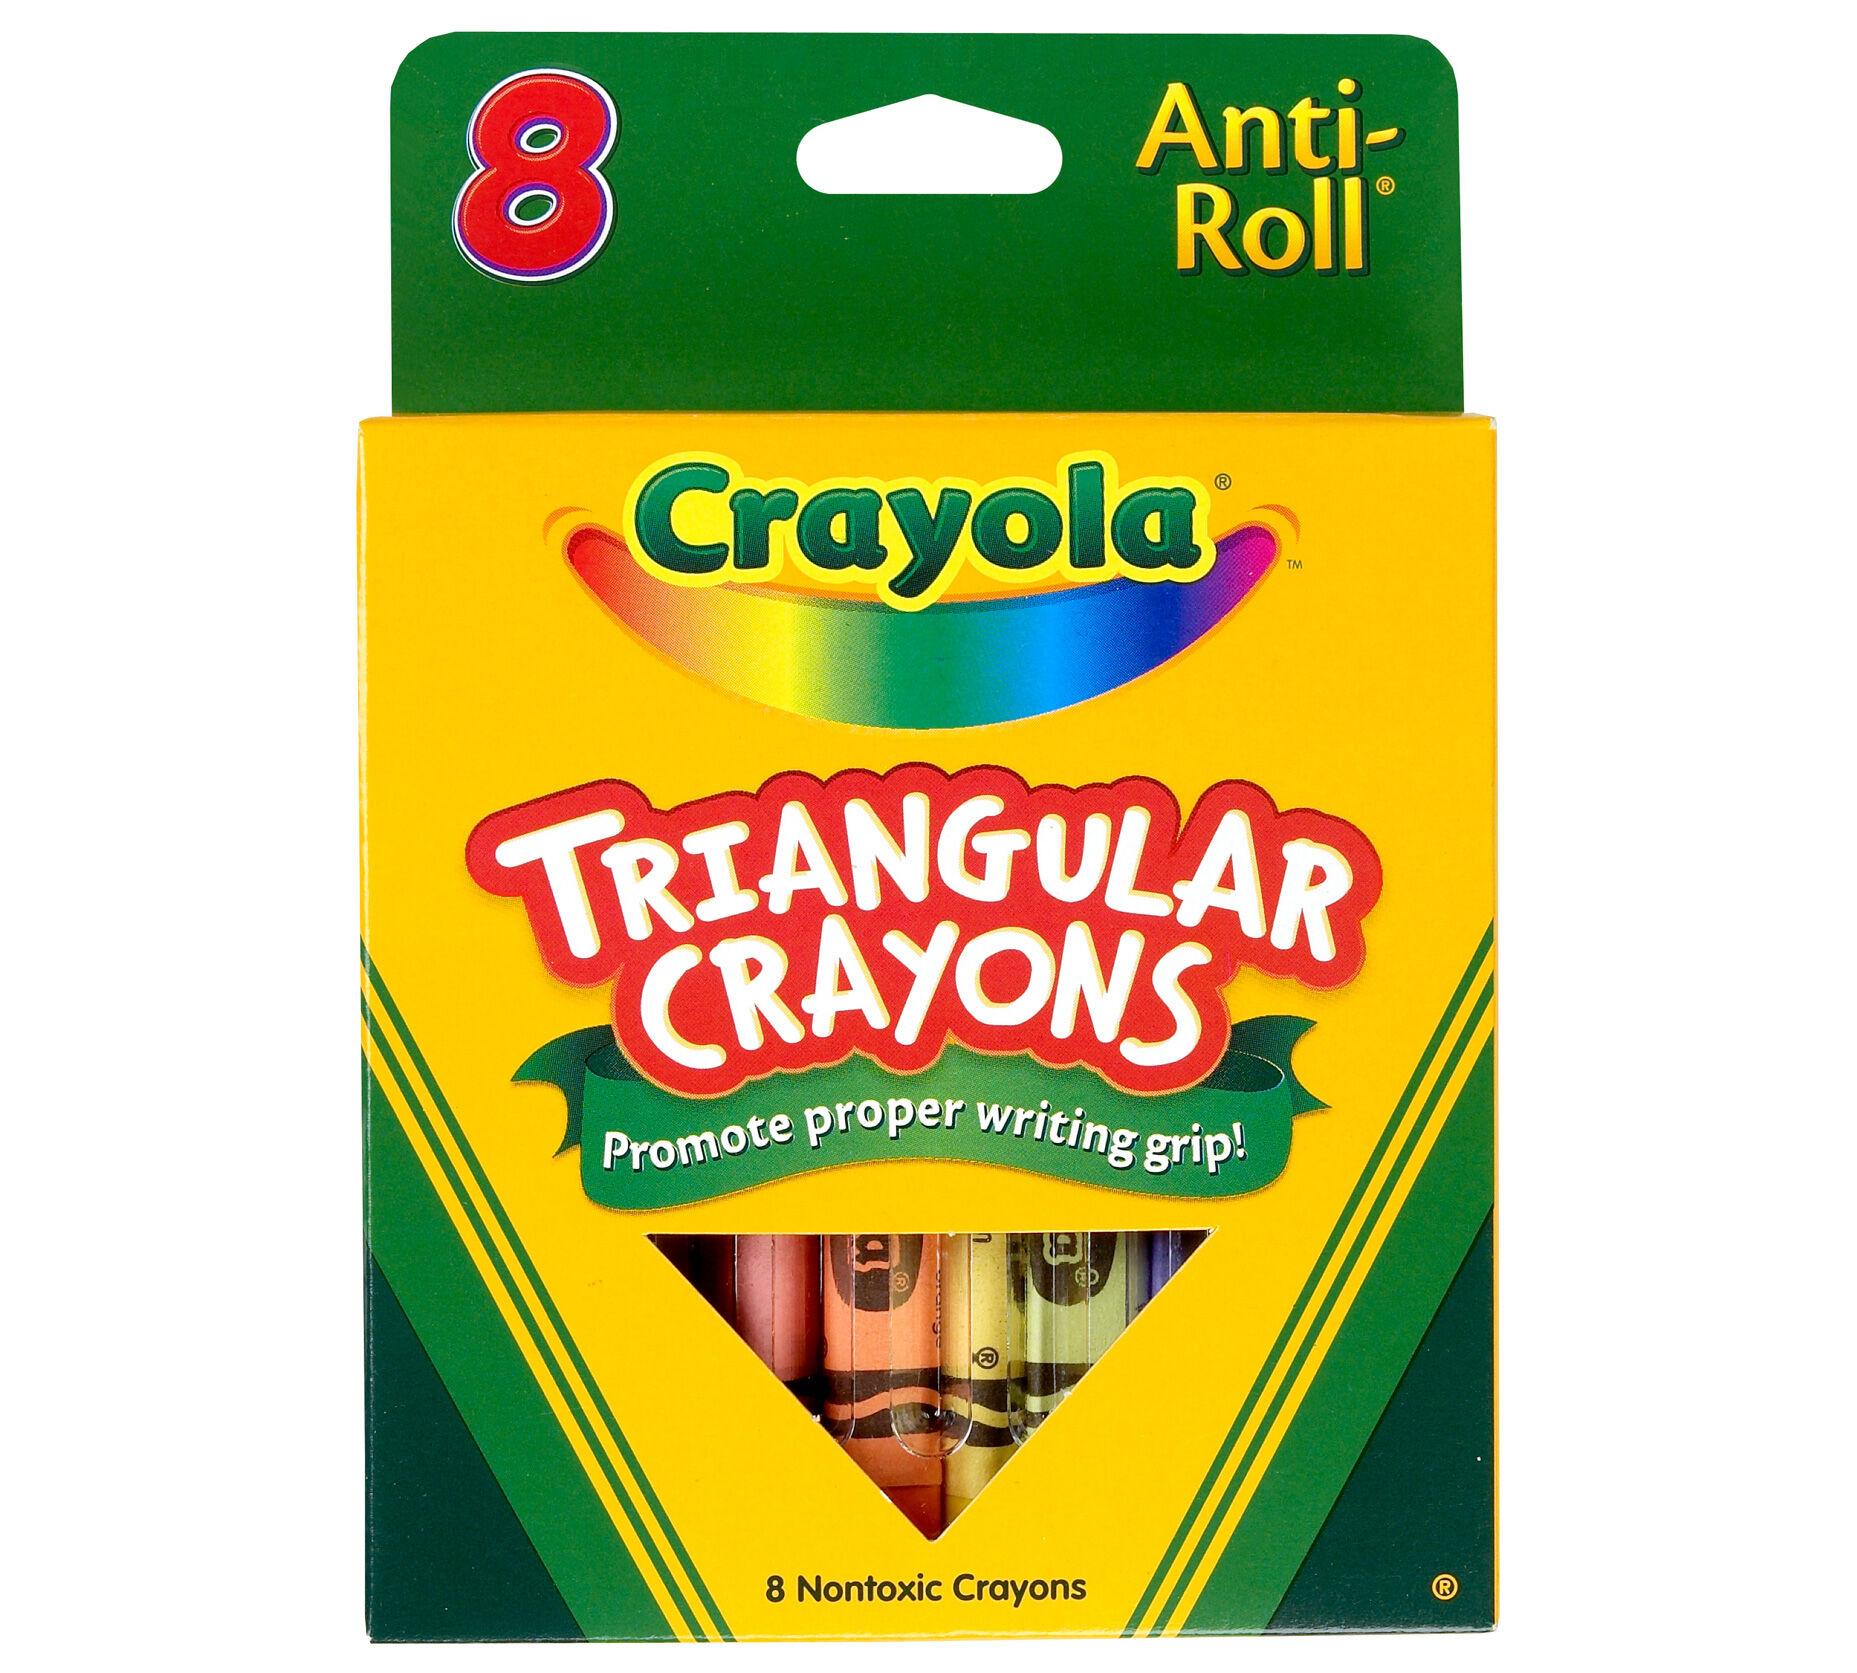 Crayola Anti-Roll Triangular Crayons Assorted Colors 8 ea